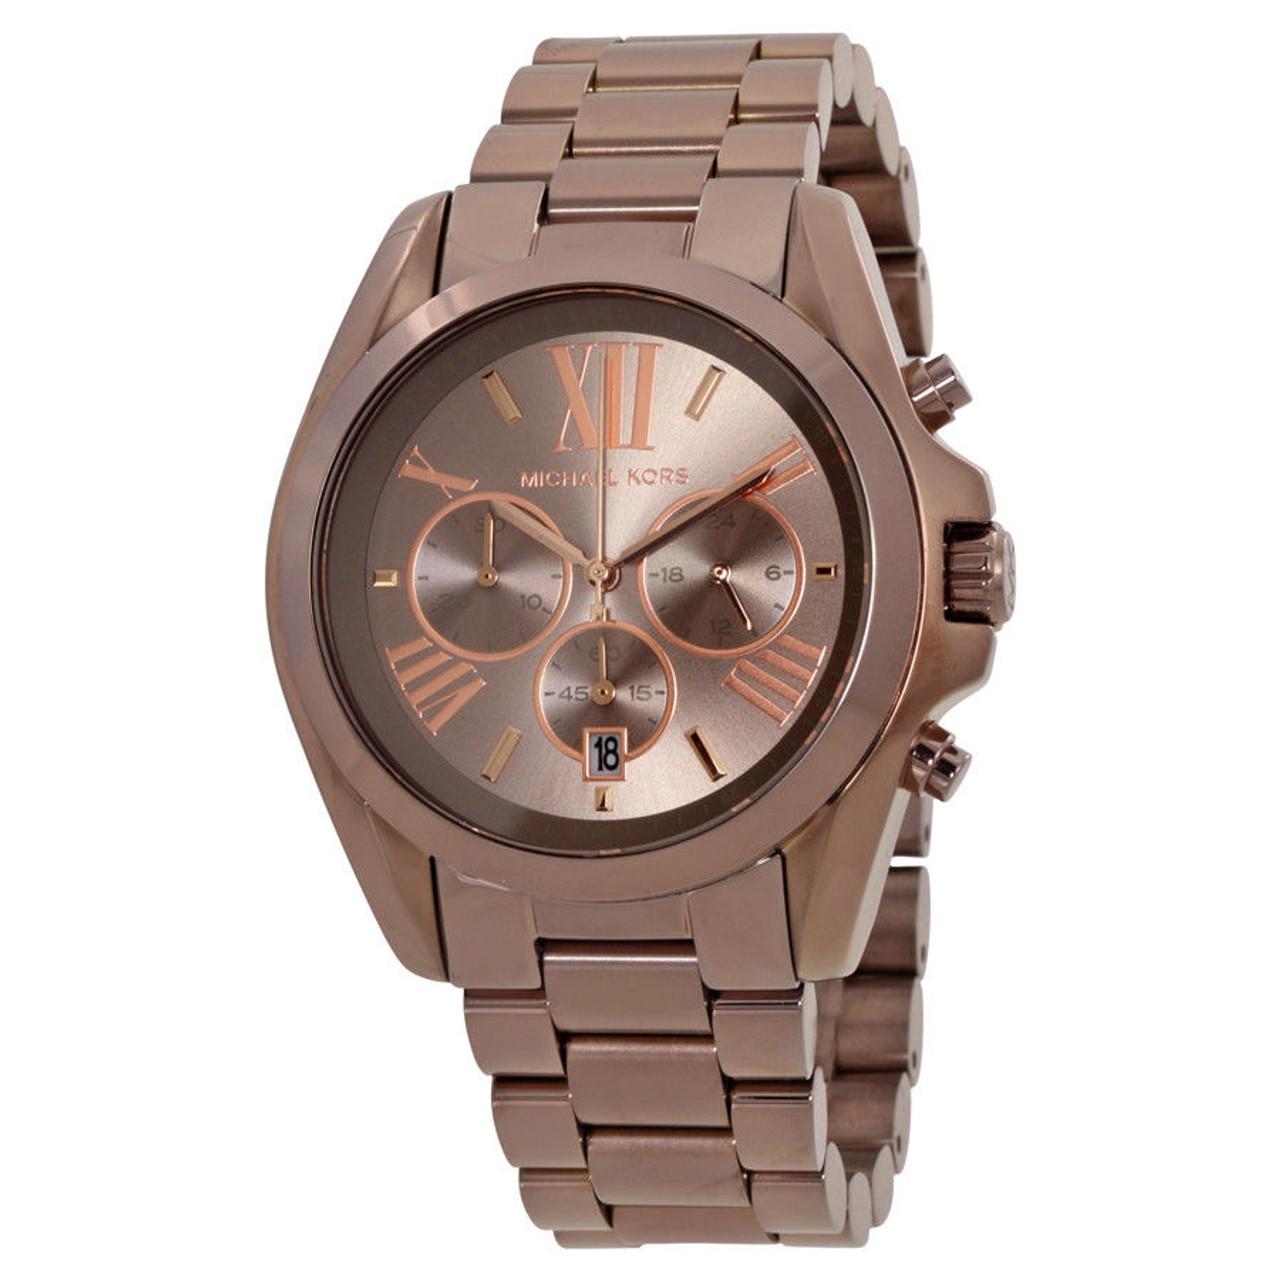 11801cc07460 Michael Kors MK6247 Bradshaw Chronograph Brown Stainless Steel Unisex Watch  - The Royal Gift Inc.